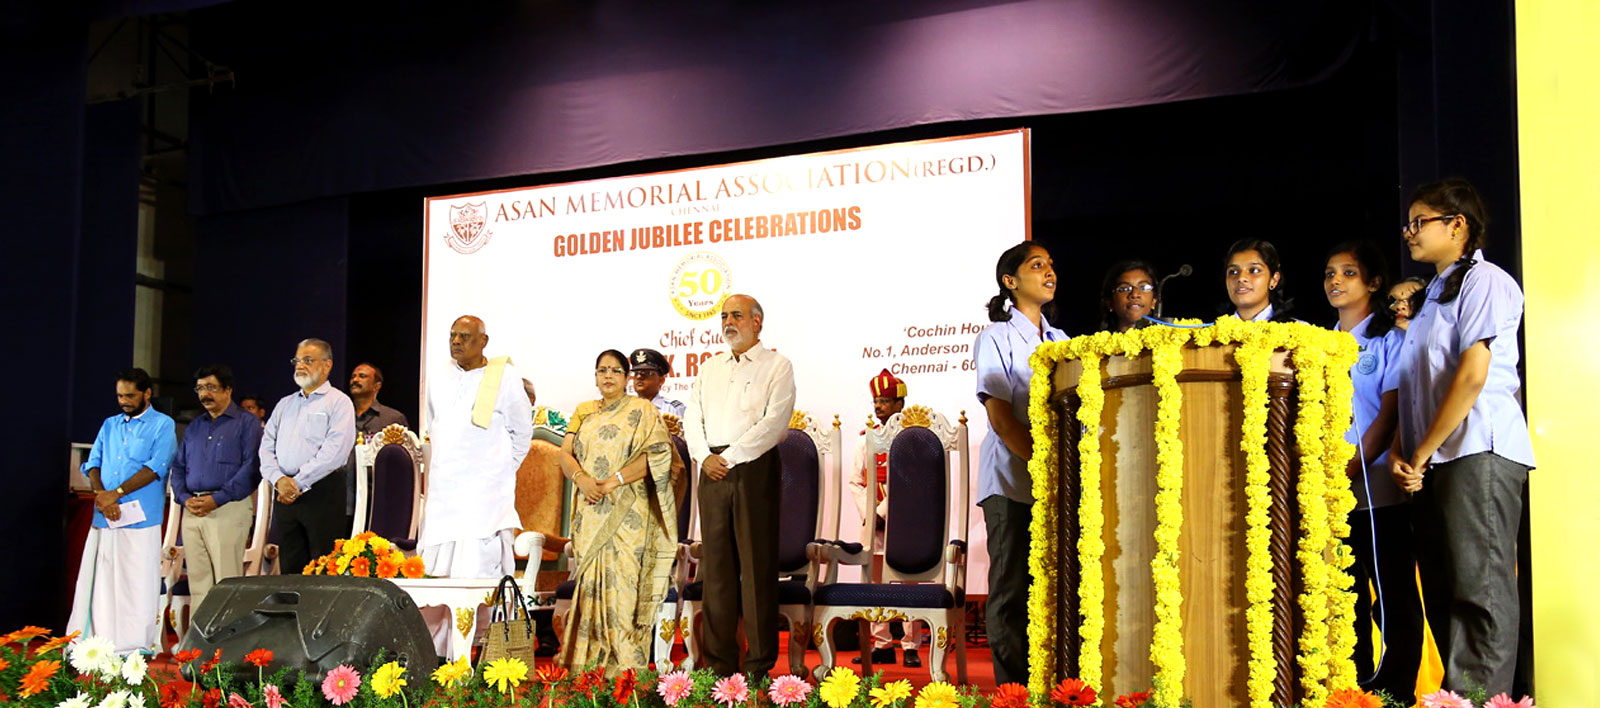 ASAN Memorial Senior Secondary School | CBSE School in Chennai